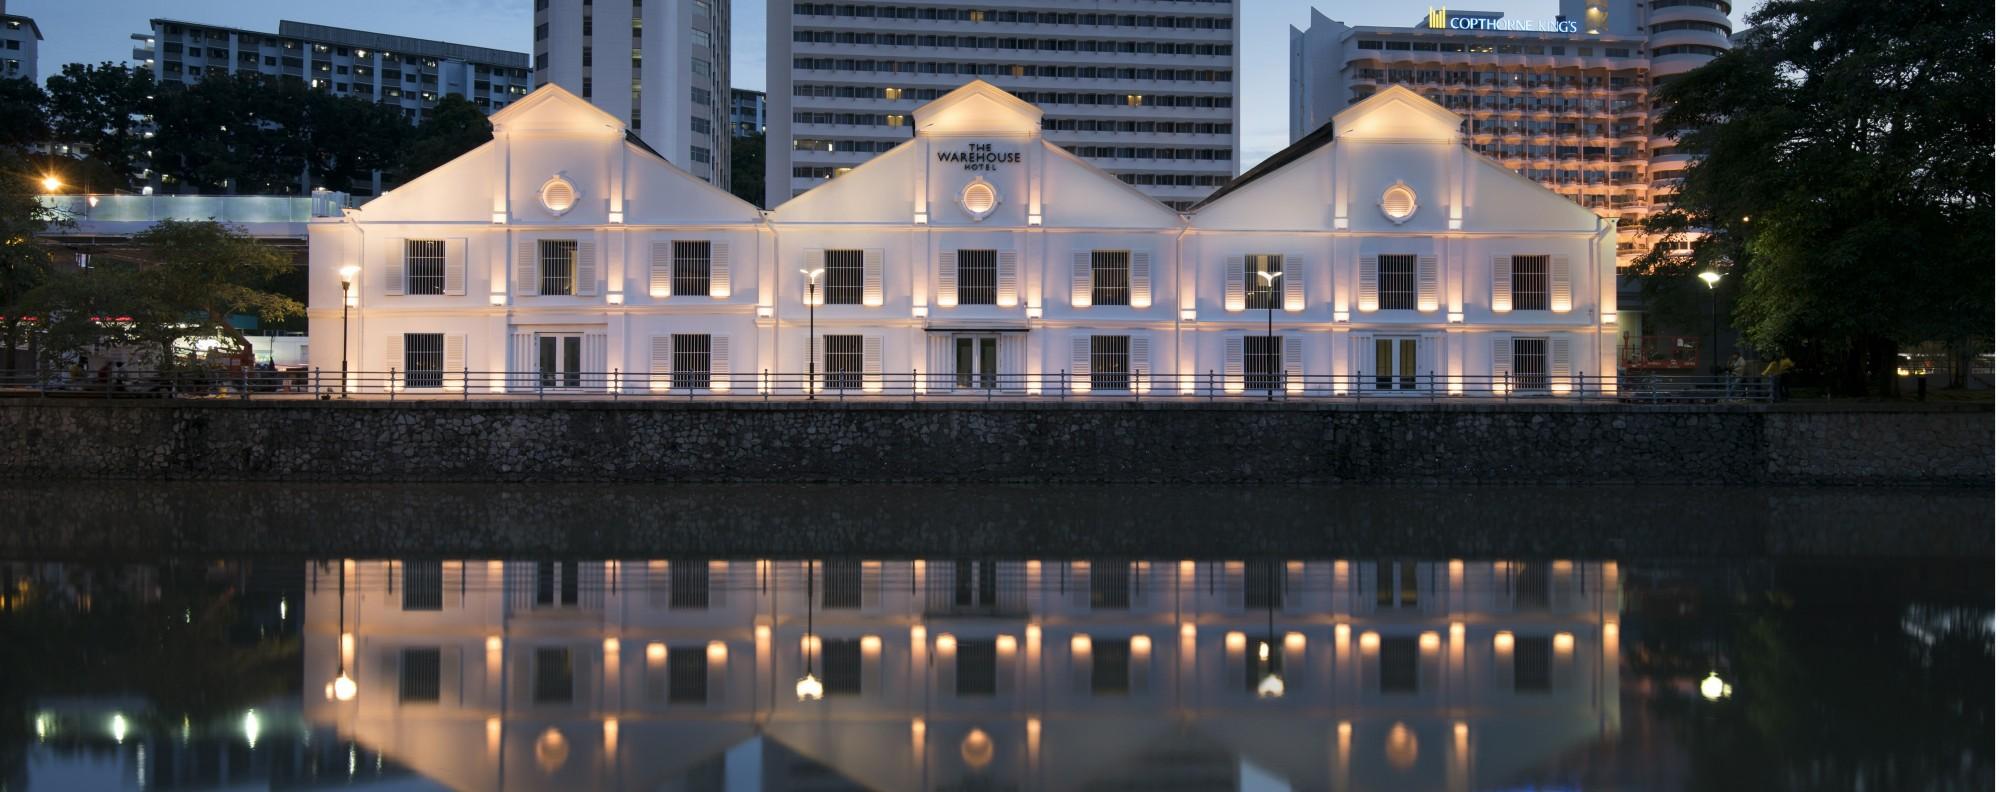 The Warehouse Hotel, Singapore.